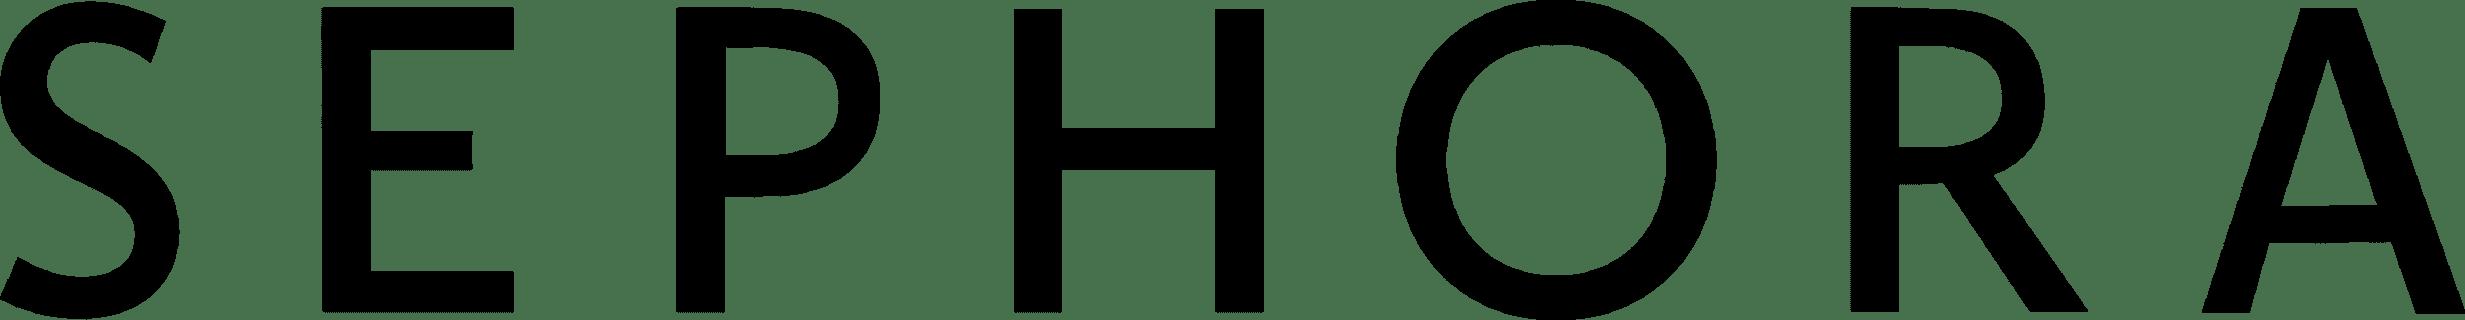 expert digital - Logo Sephora